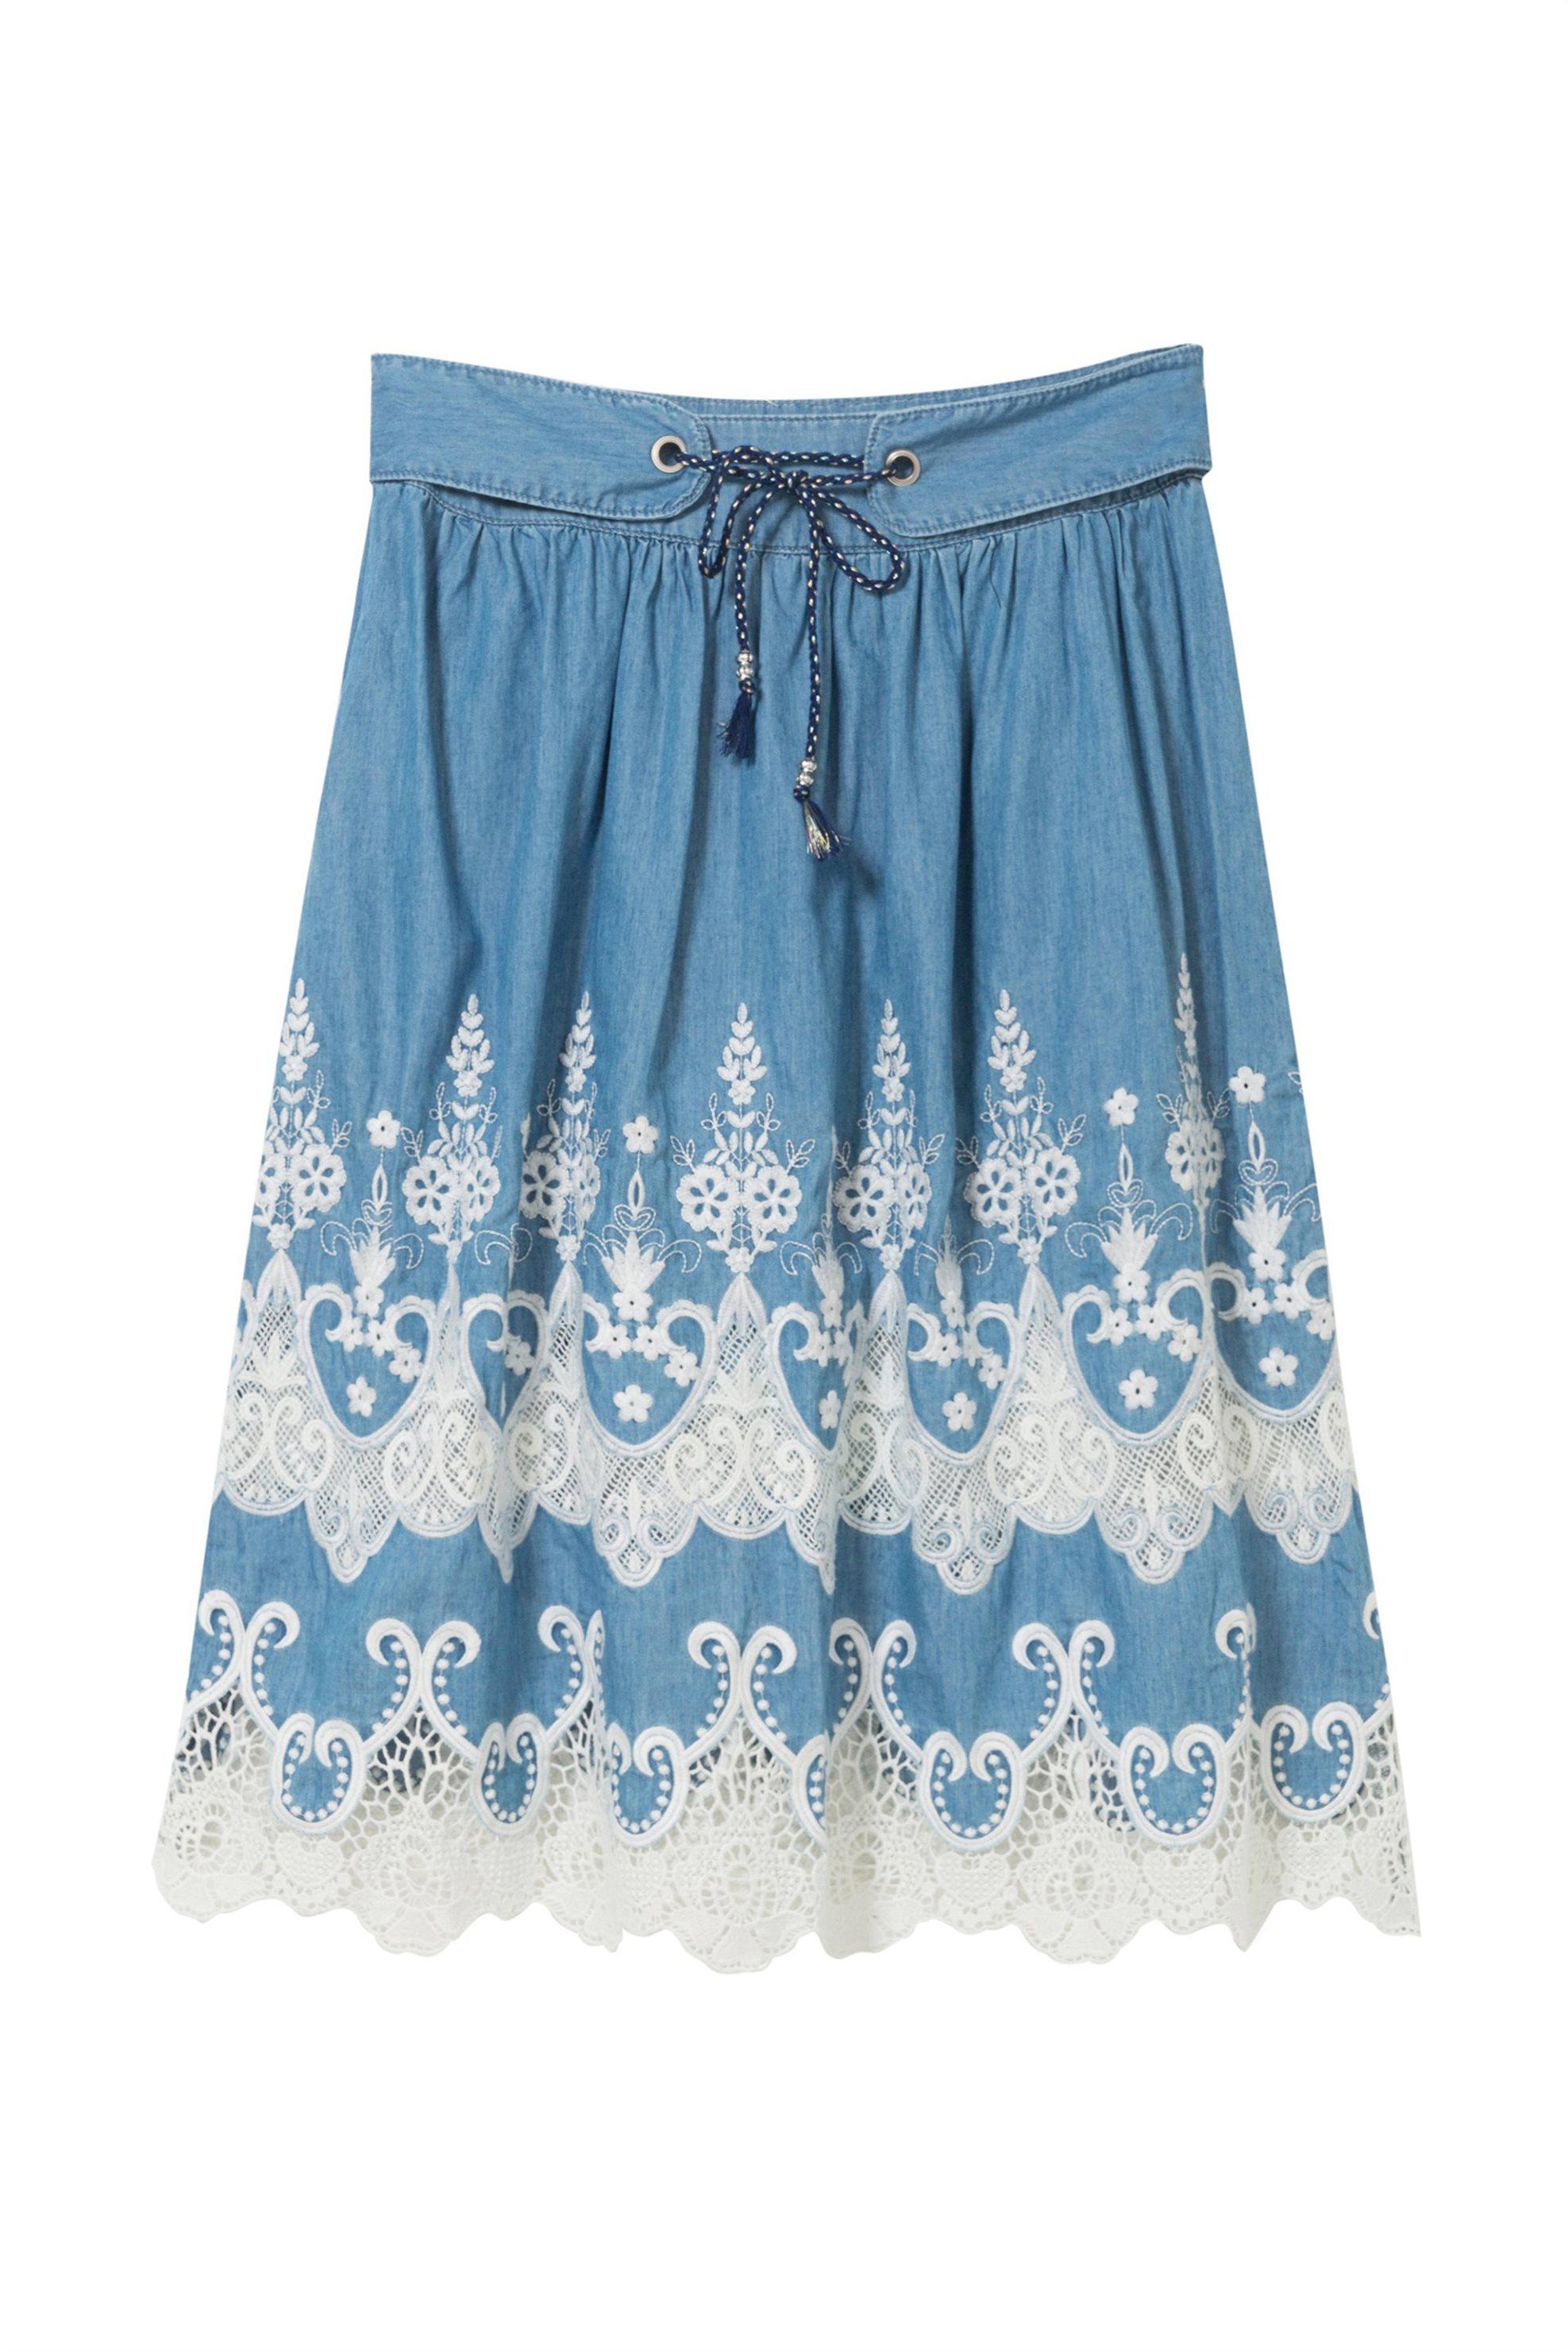 d2187c2dbf4 Γυναικεία τζην φούστα με δαντέλα Desigual 18S...